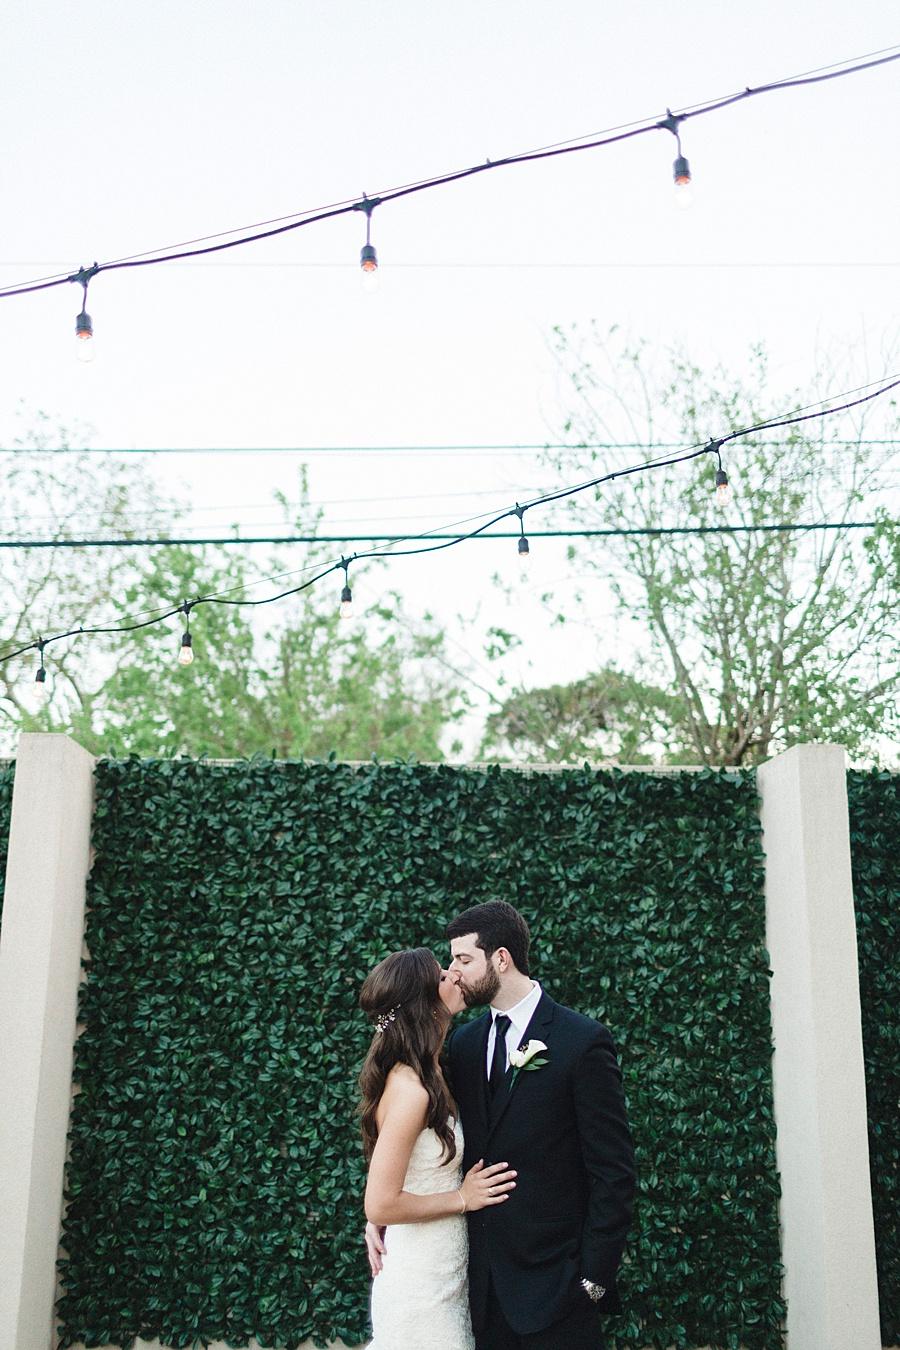 Stacy Anderson Photography Heights Villa wedding photographer_0020.jpg